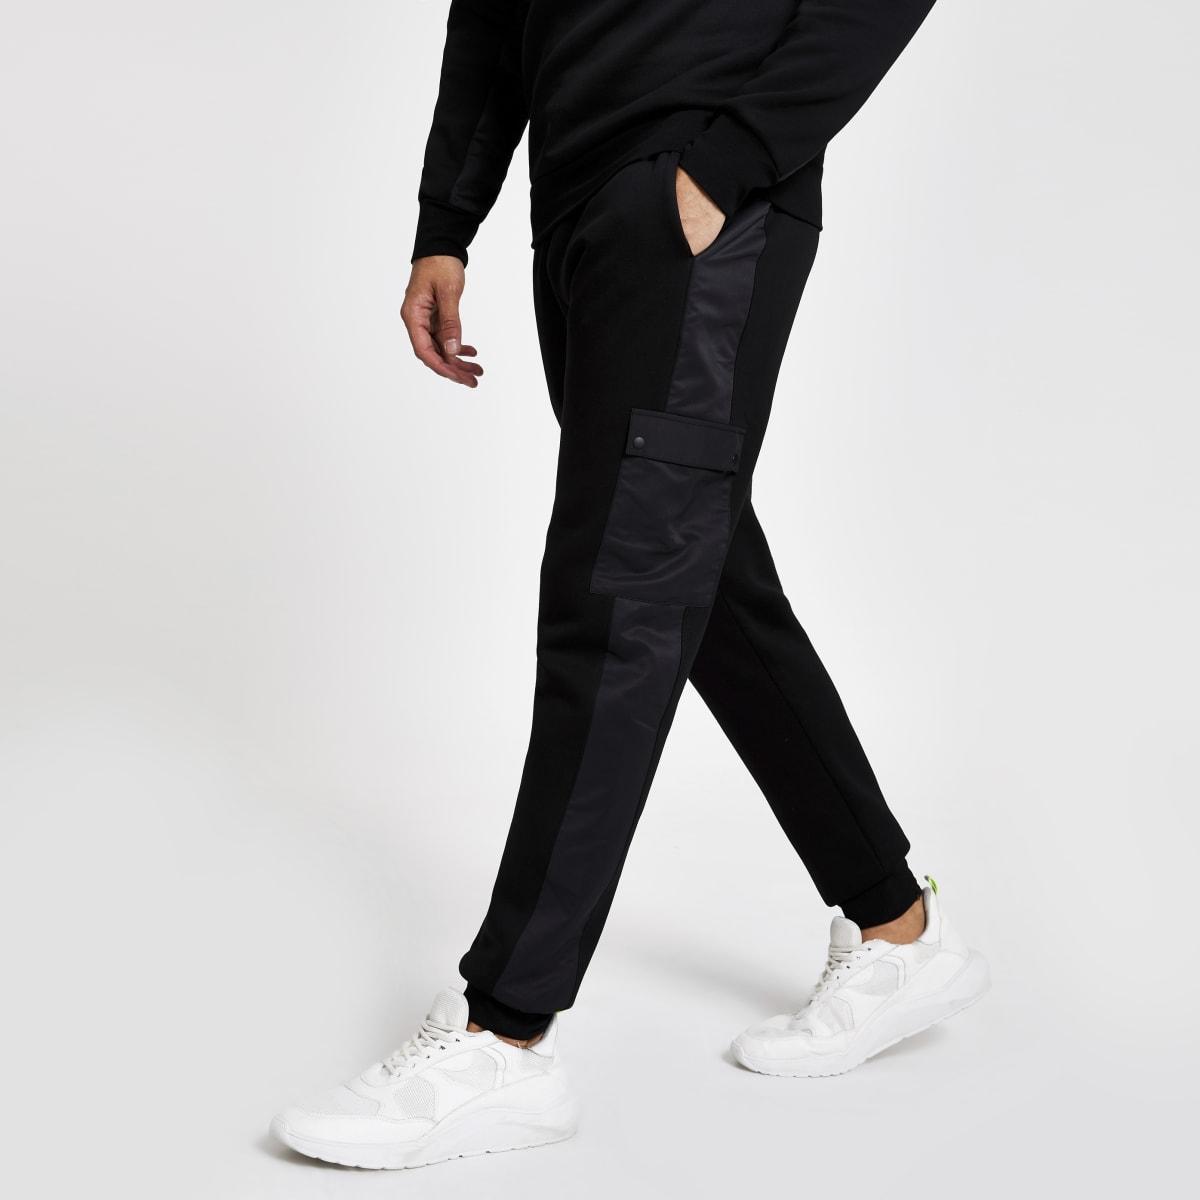 Schwarze Slim Fit Utility Jogginghose